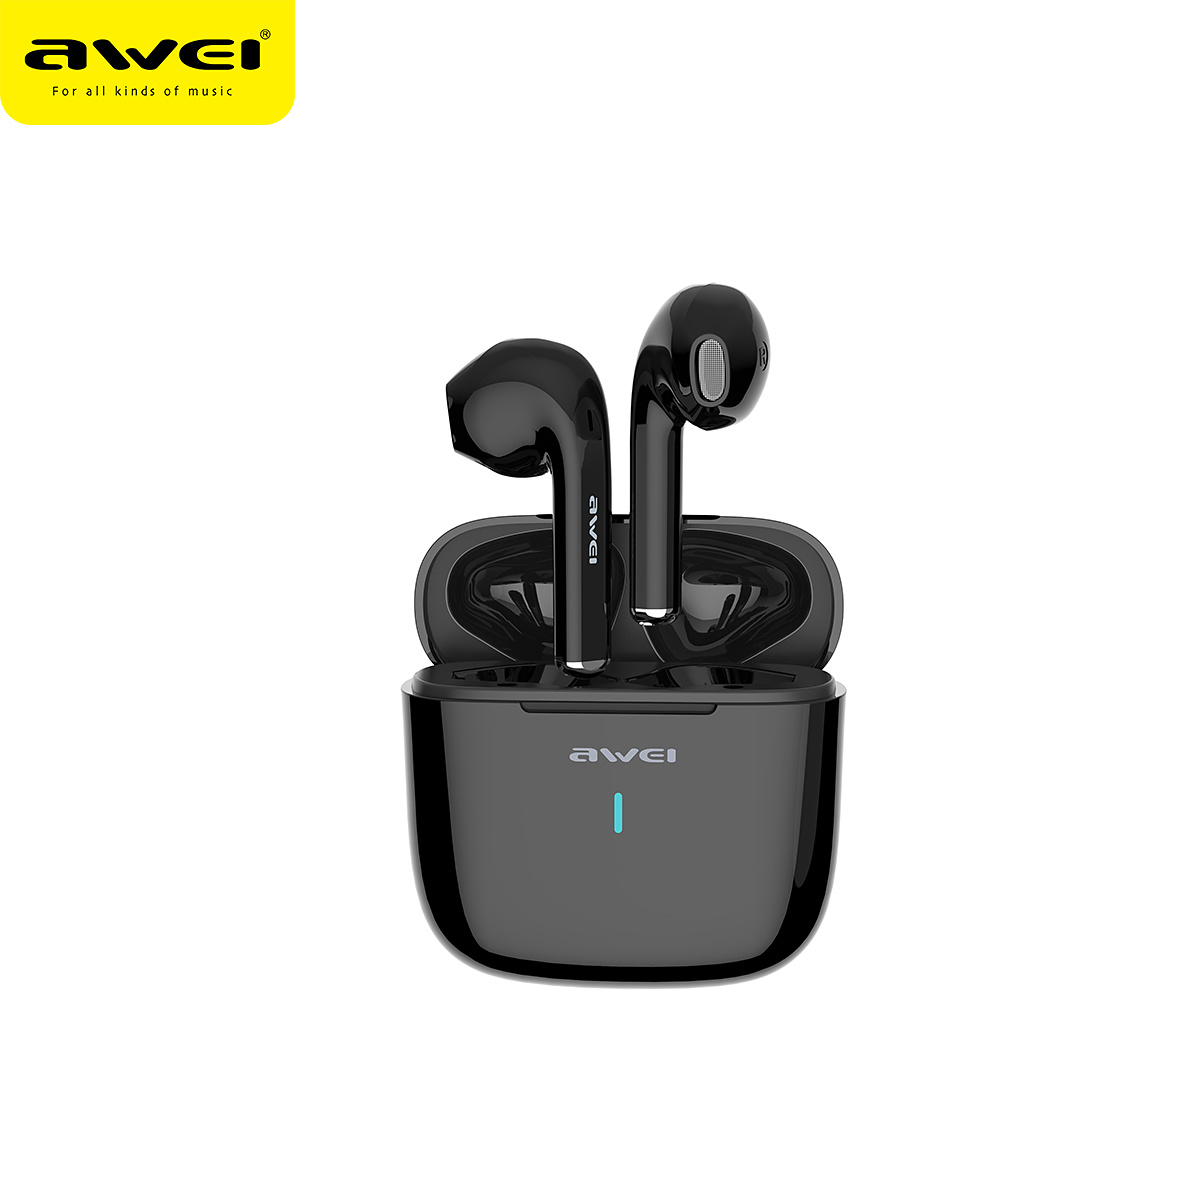 AWEI T26 Trådlösa in-ear hörlurar, Bluetooth 5.0, svart